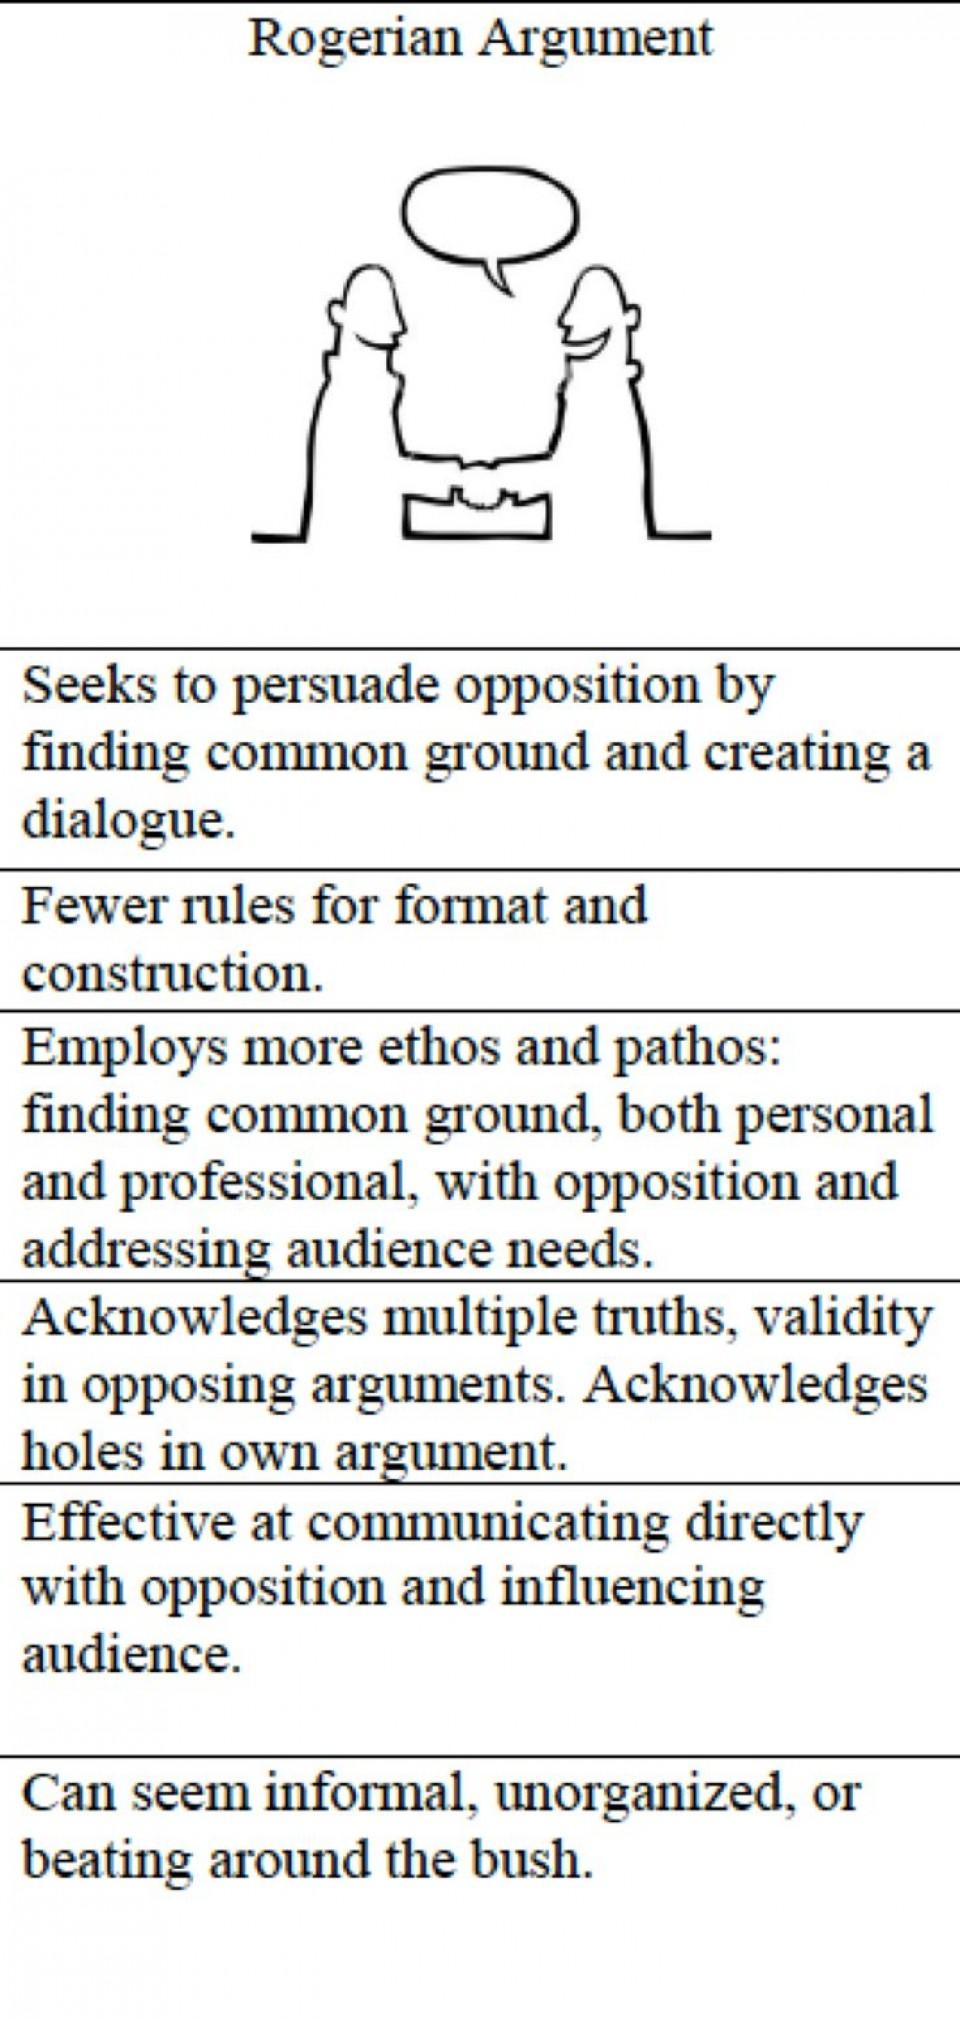 English paper grading symbols